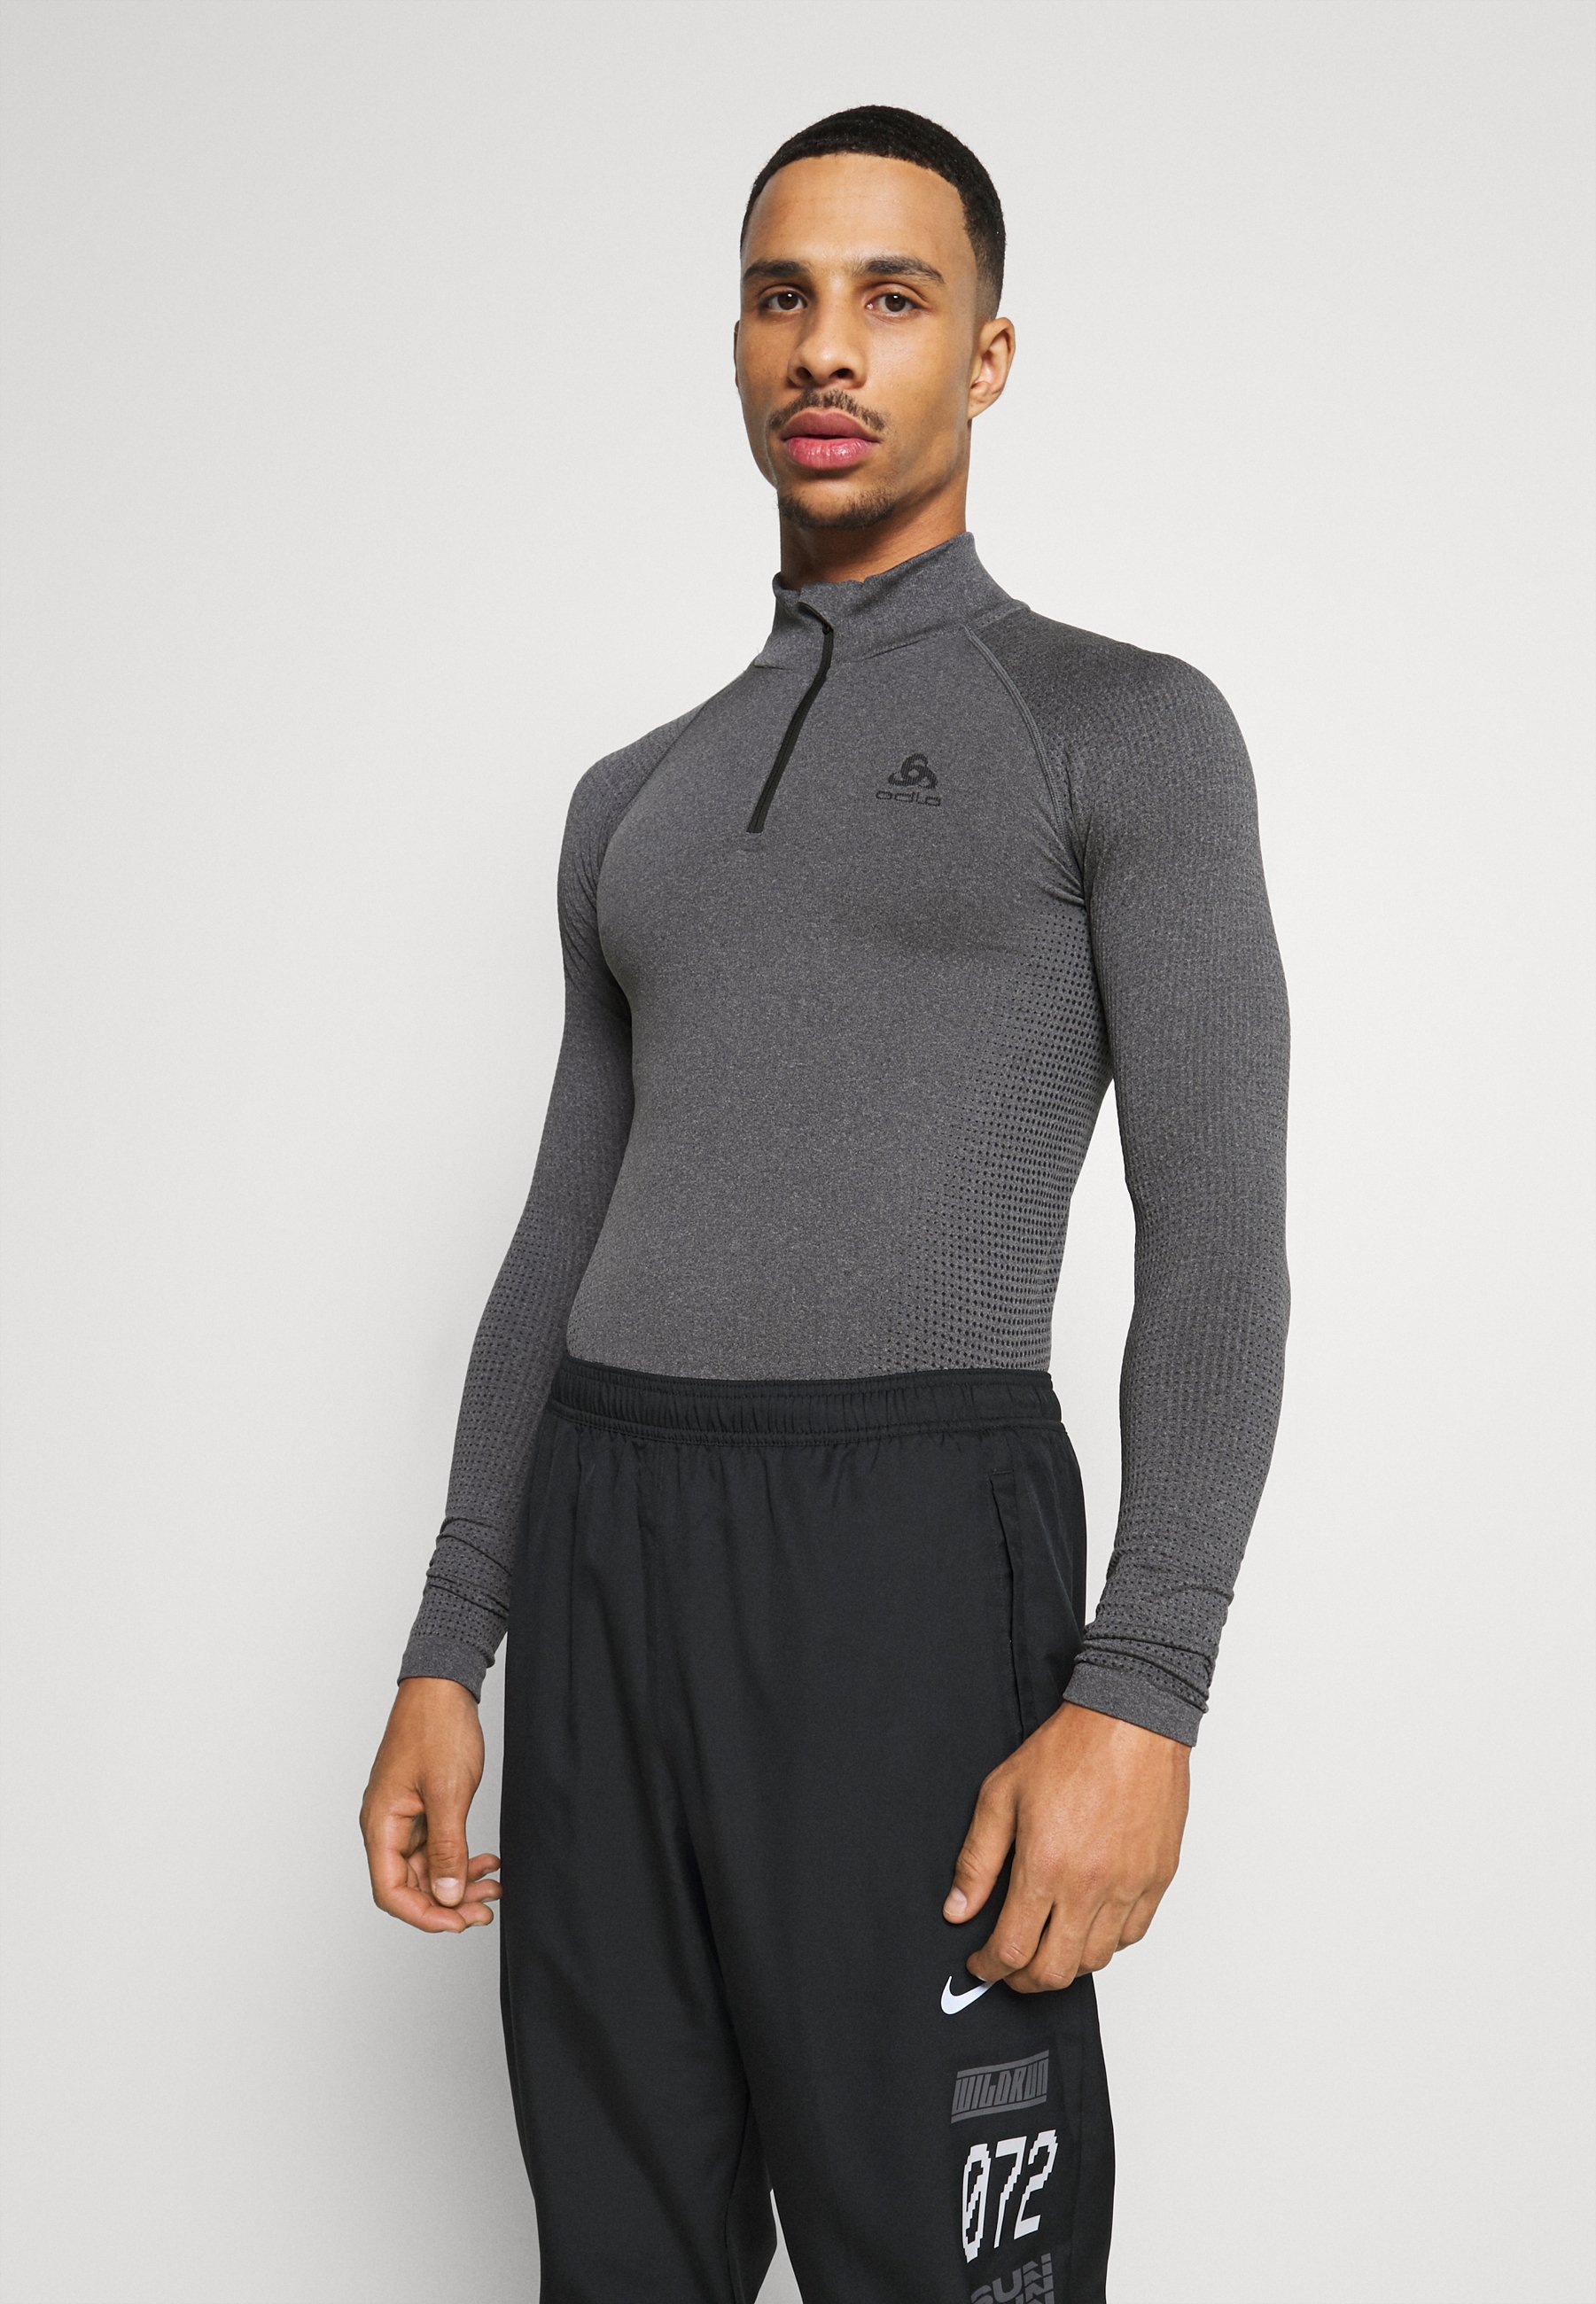 Herren PERFORMANCE WARM ECO TURTLE NECK HALF ZIP - Unterhemd/-shirt